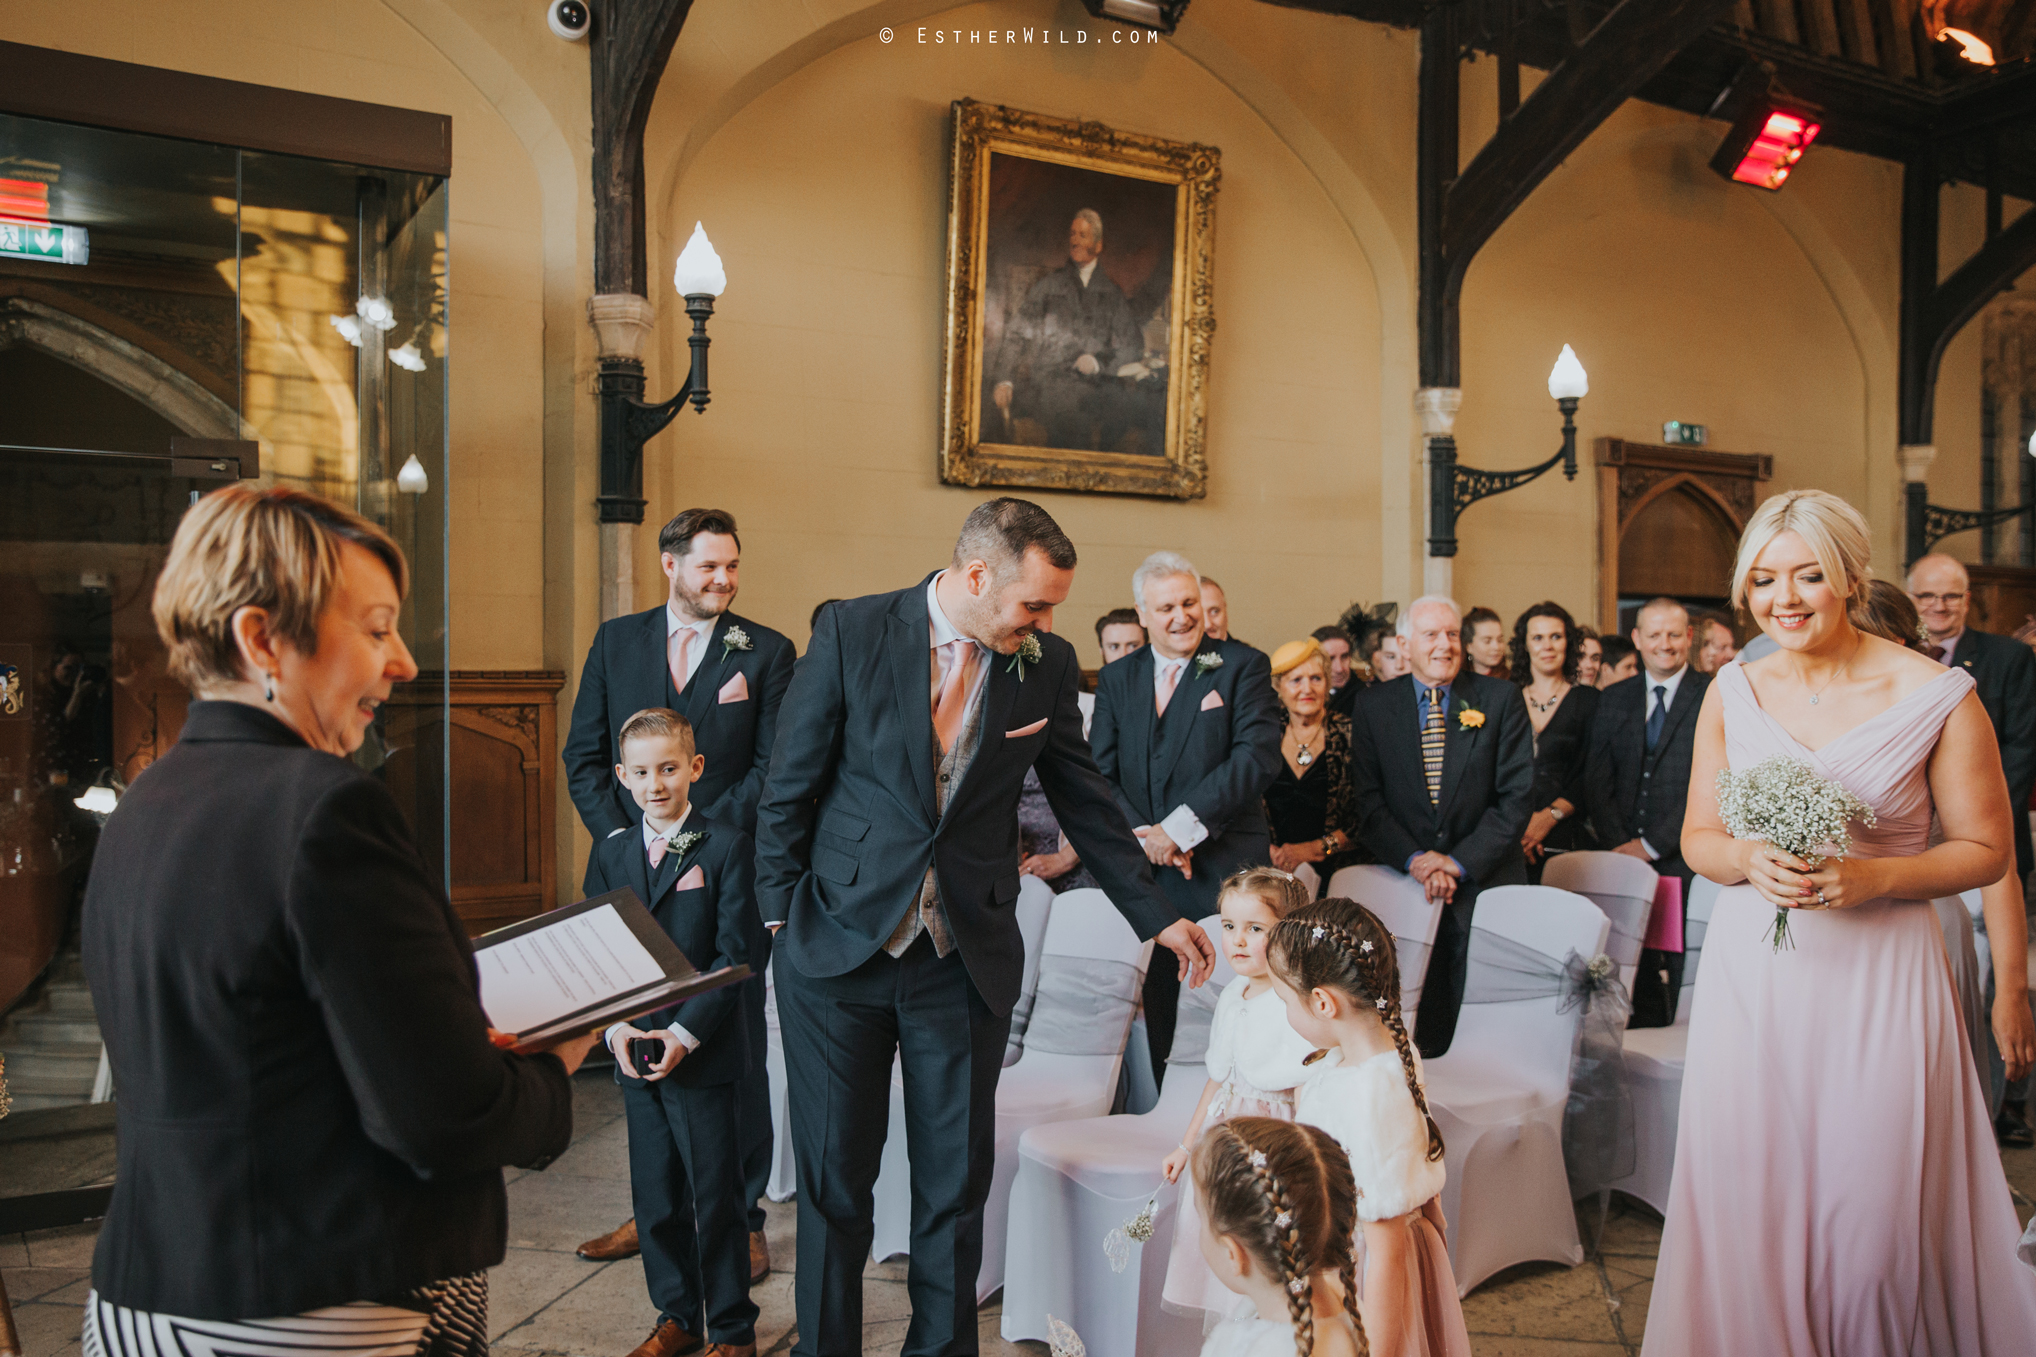 Wedding_Kings_Lynn_Town_Hall_Norfolk_Photographer_Esther_Wild_IMG_0917.jpg